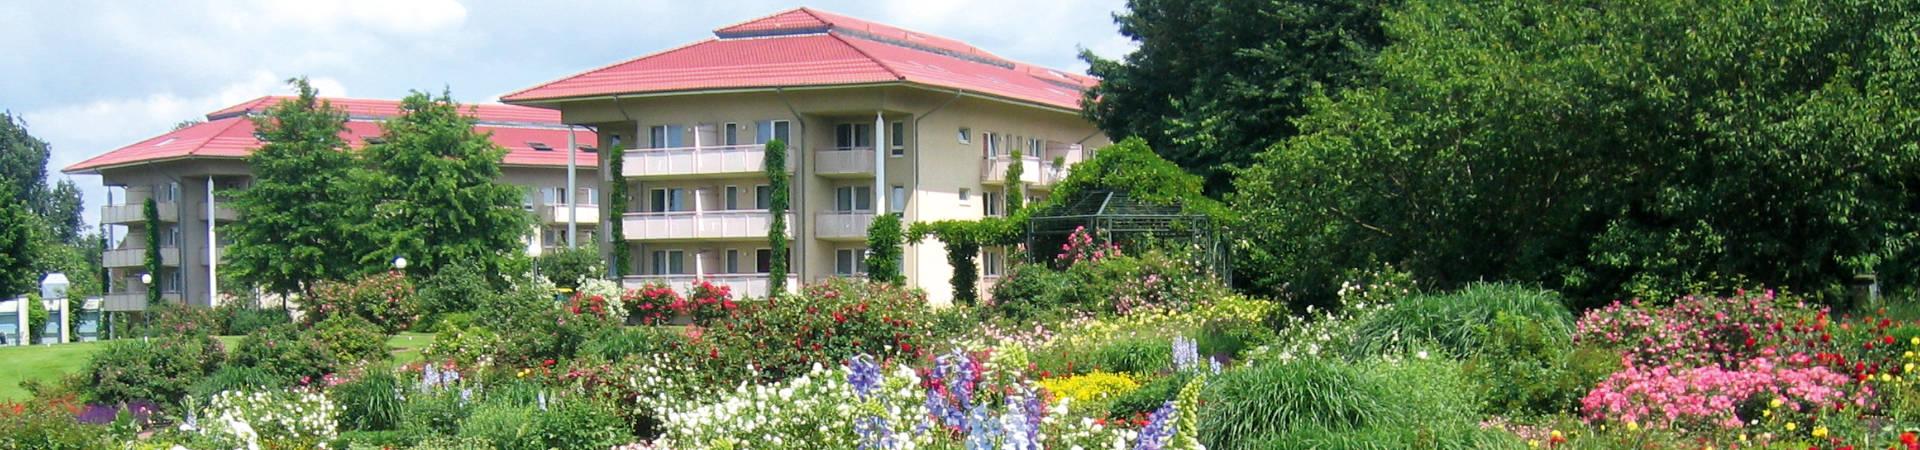 Klinik Lindenplatz - moderne Rehabilitation & innovative Therapien